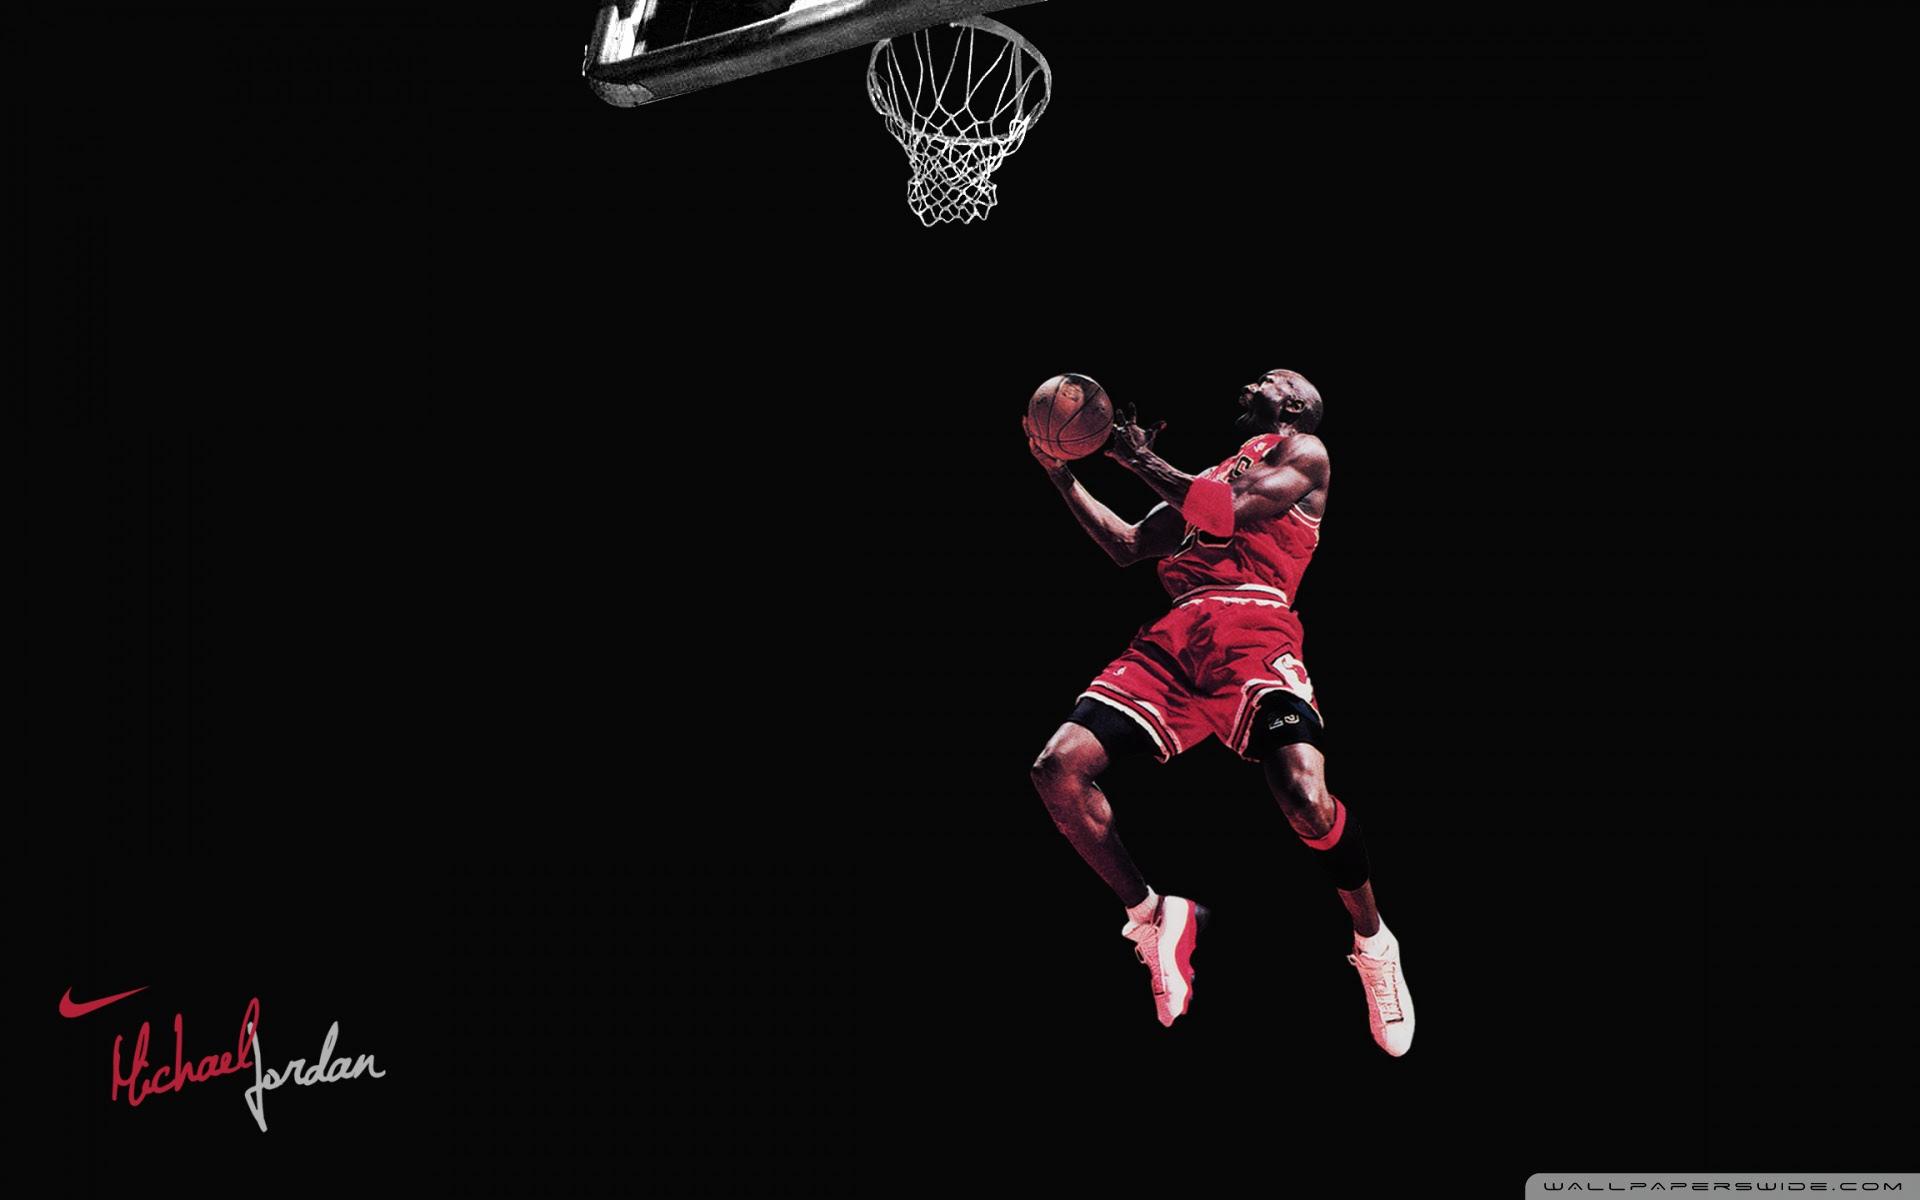 Michael Jordan Clean Ultra Hd Desktop Background Wallpaper For 4k Uhd Tv Widescreen Ultrawide Desktop Laptop Tablet Smartphone